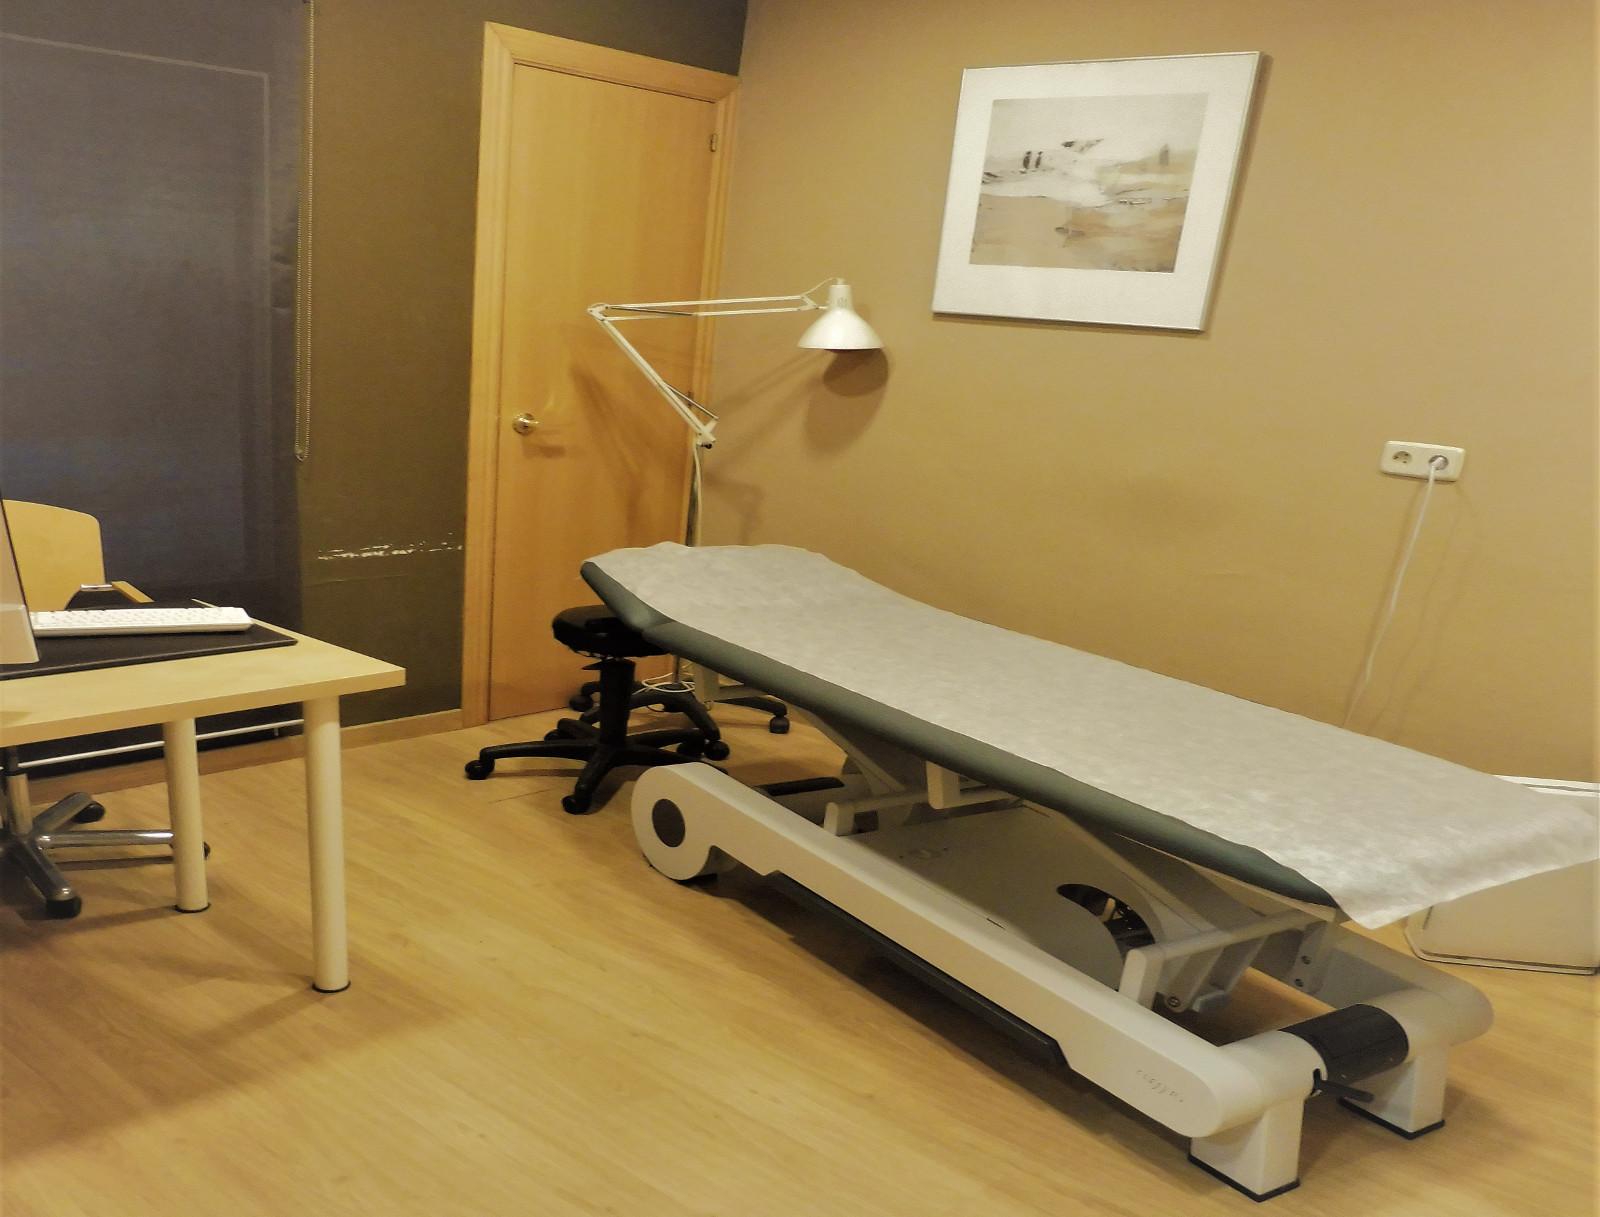 Sala de Osteopatía y Fisioterápia